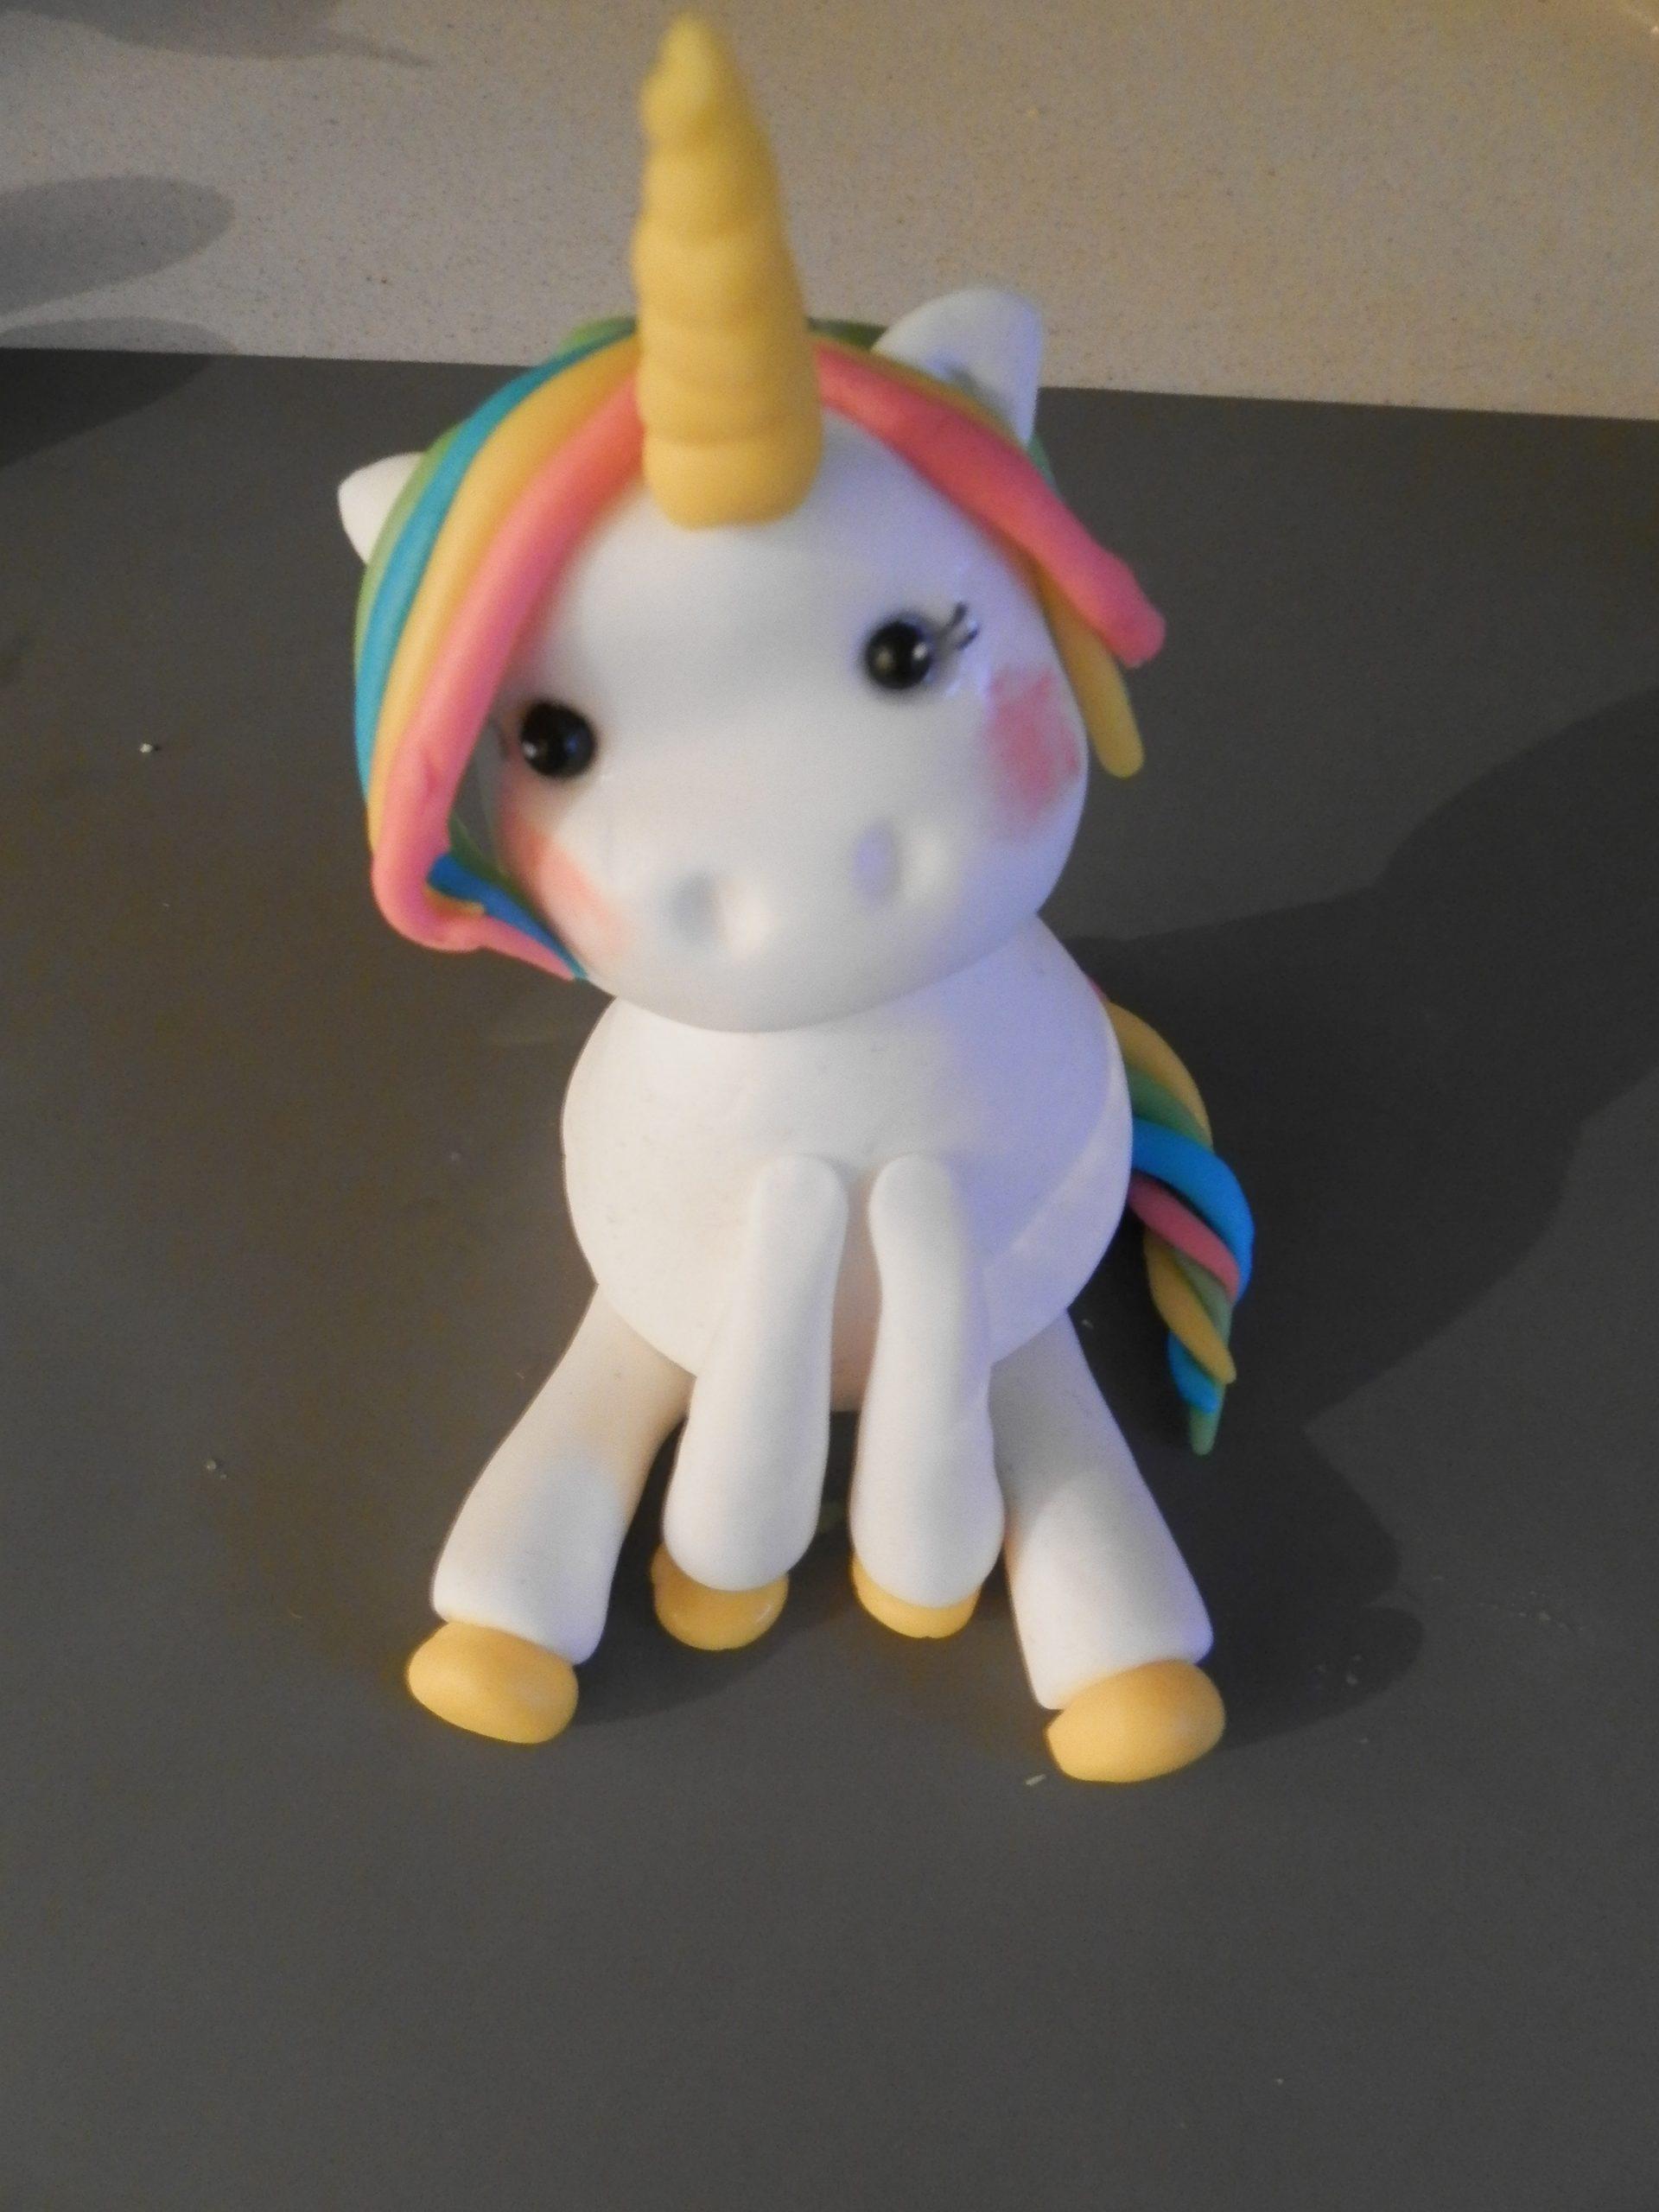 DIY Unicorn taarttopper van fondant maken